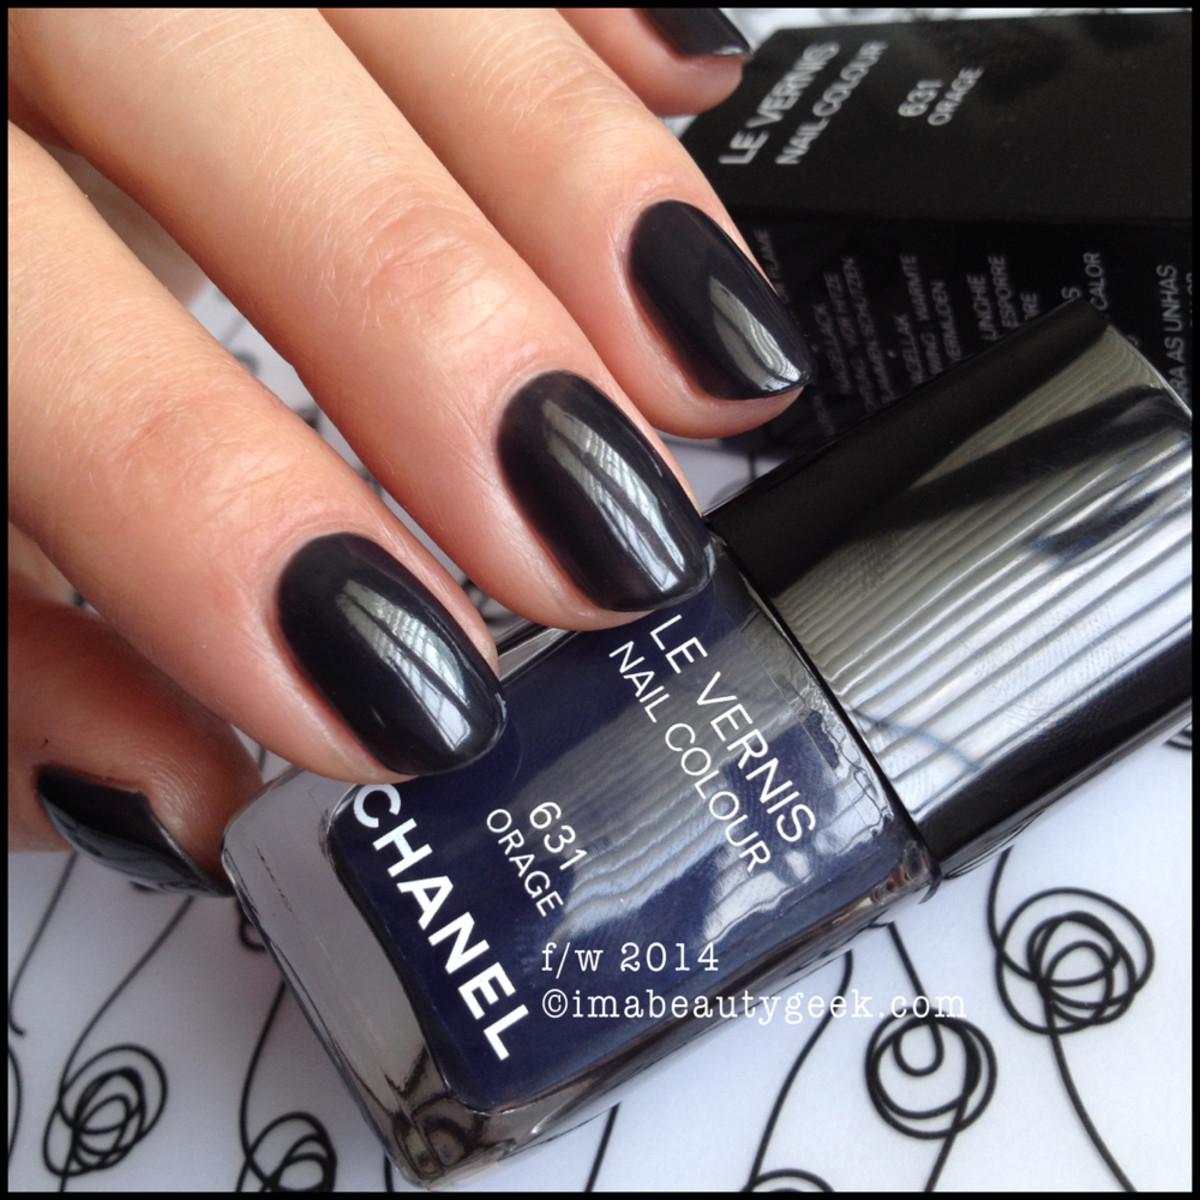 Chanel Orage 631 fw2014 beautygeeks